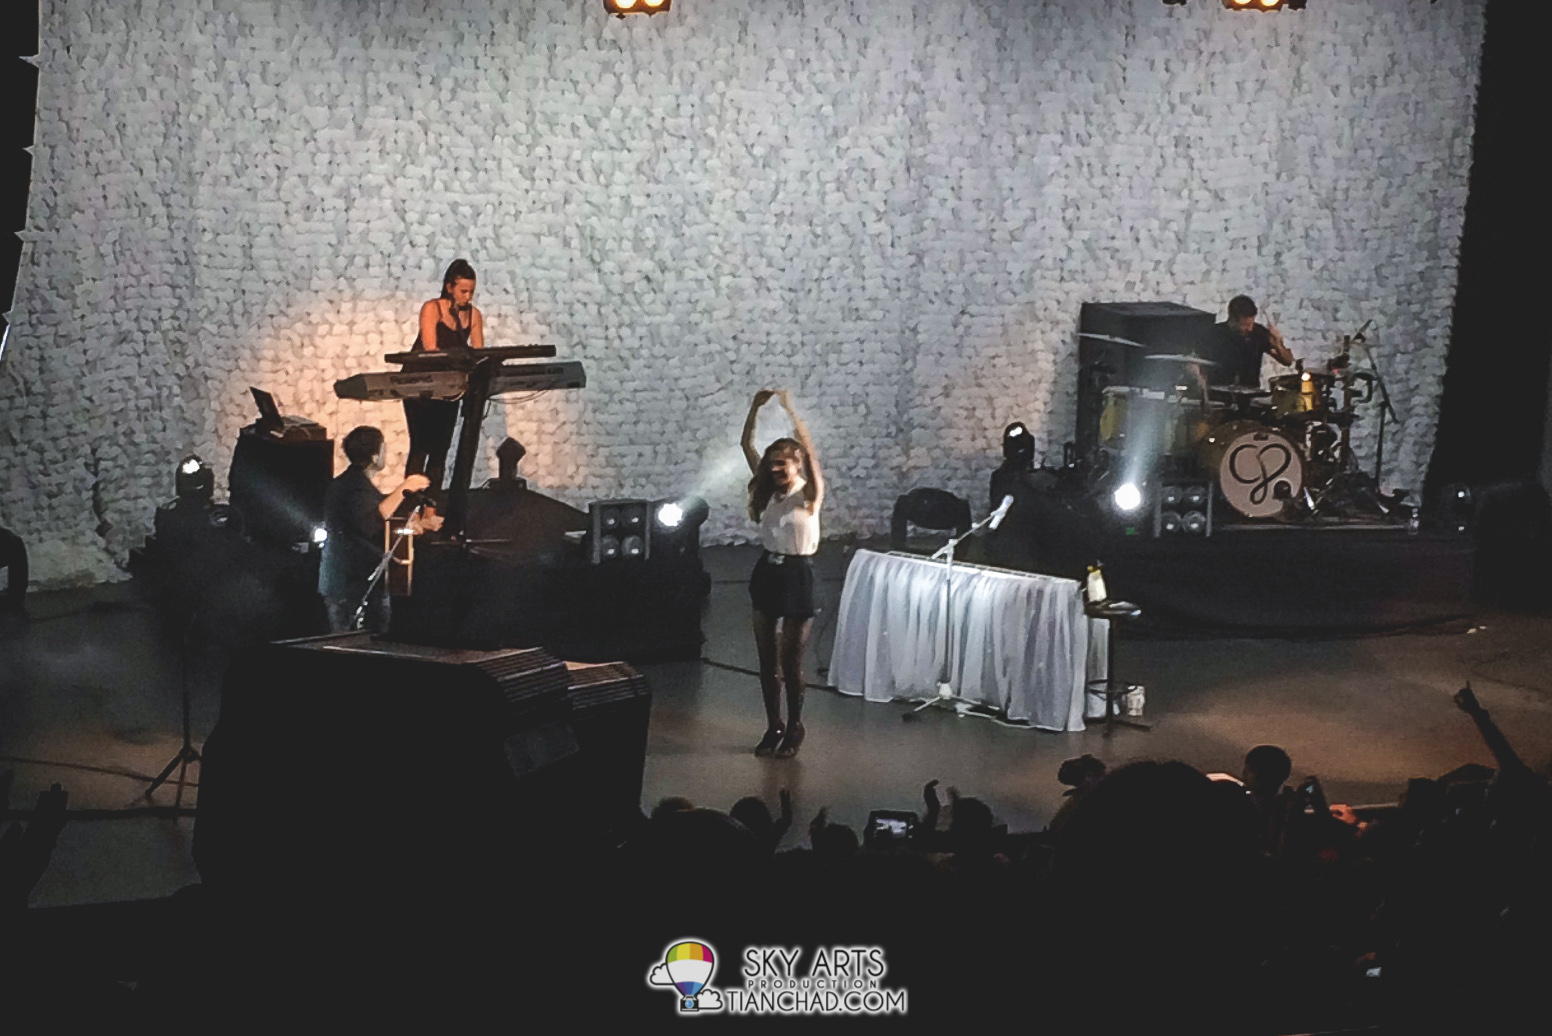 Christina Perri Live in KL 2015 - Actual Concert Night @ KL Live Ballerina Christina